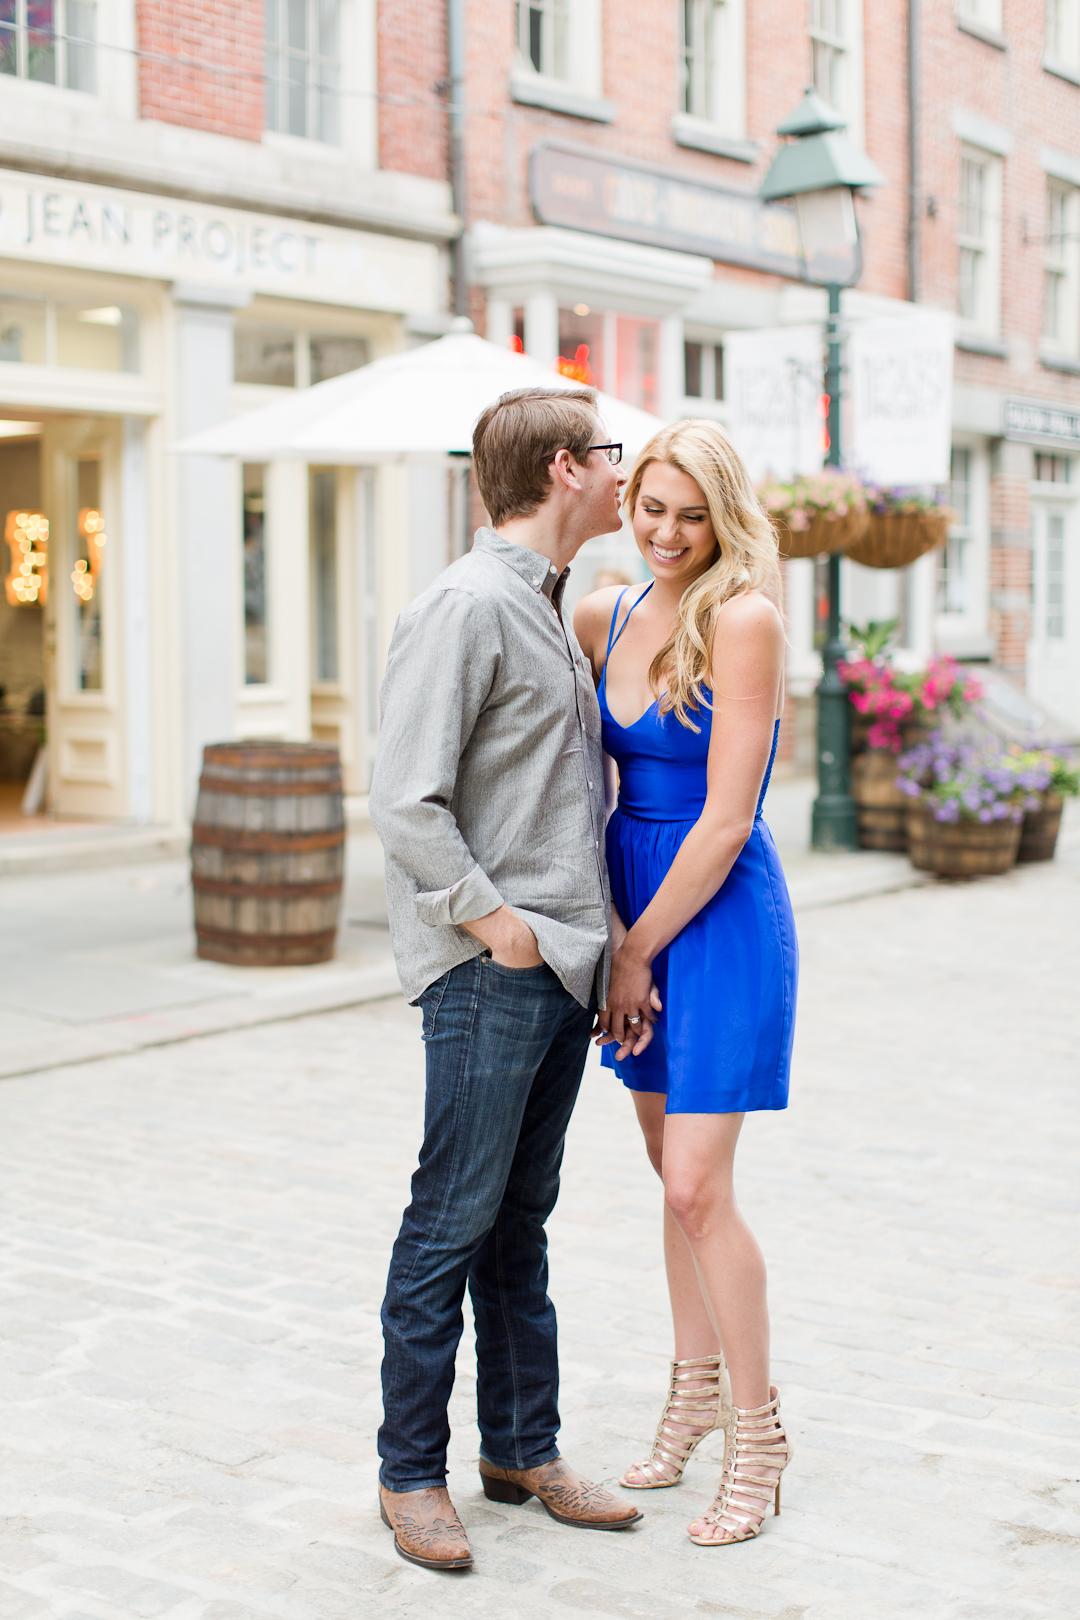 Melissa Kruse Photography - Kelley & Billy Engagement Photos-40.jpg